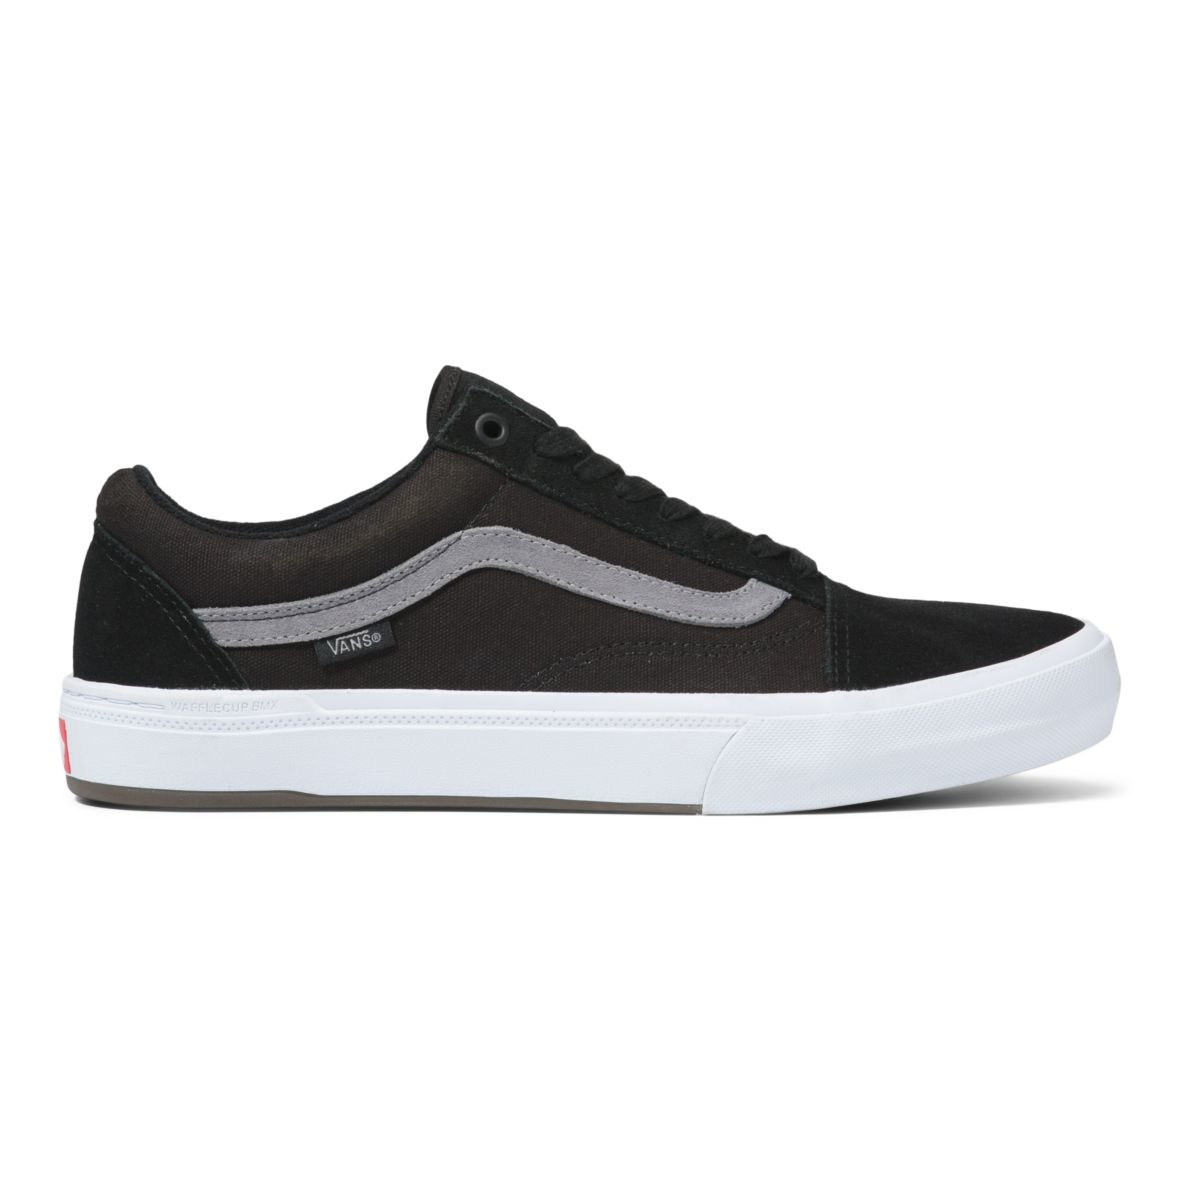 Vans BMX Old Skool Pro Shoe - Black/Gray/White